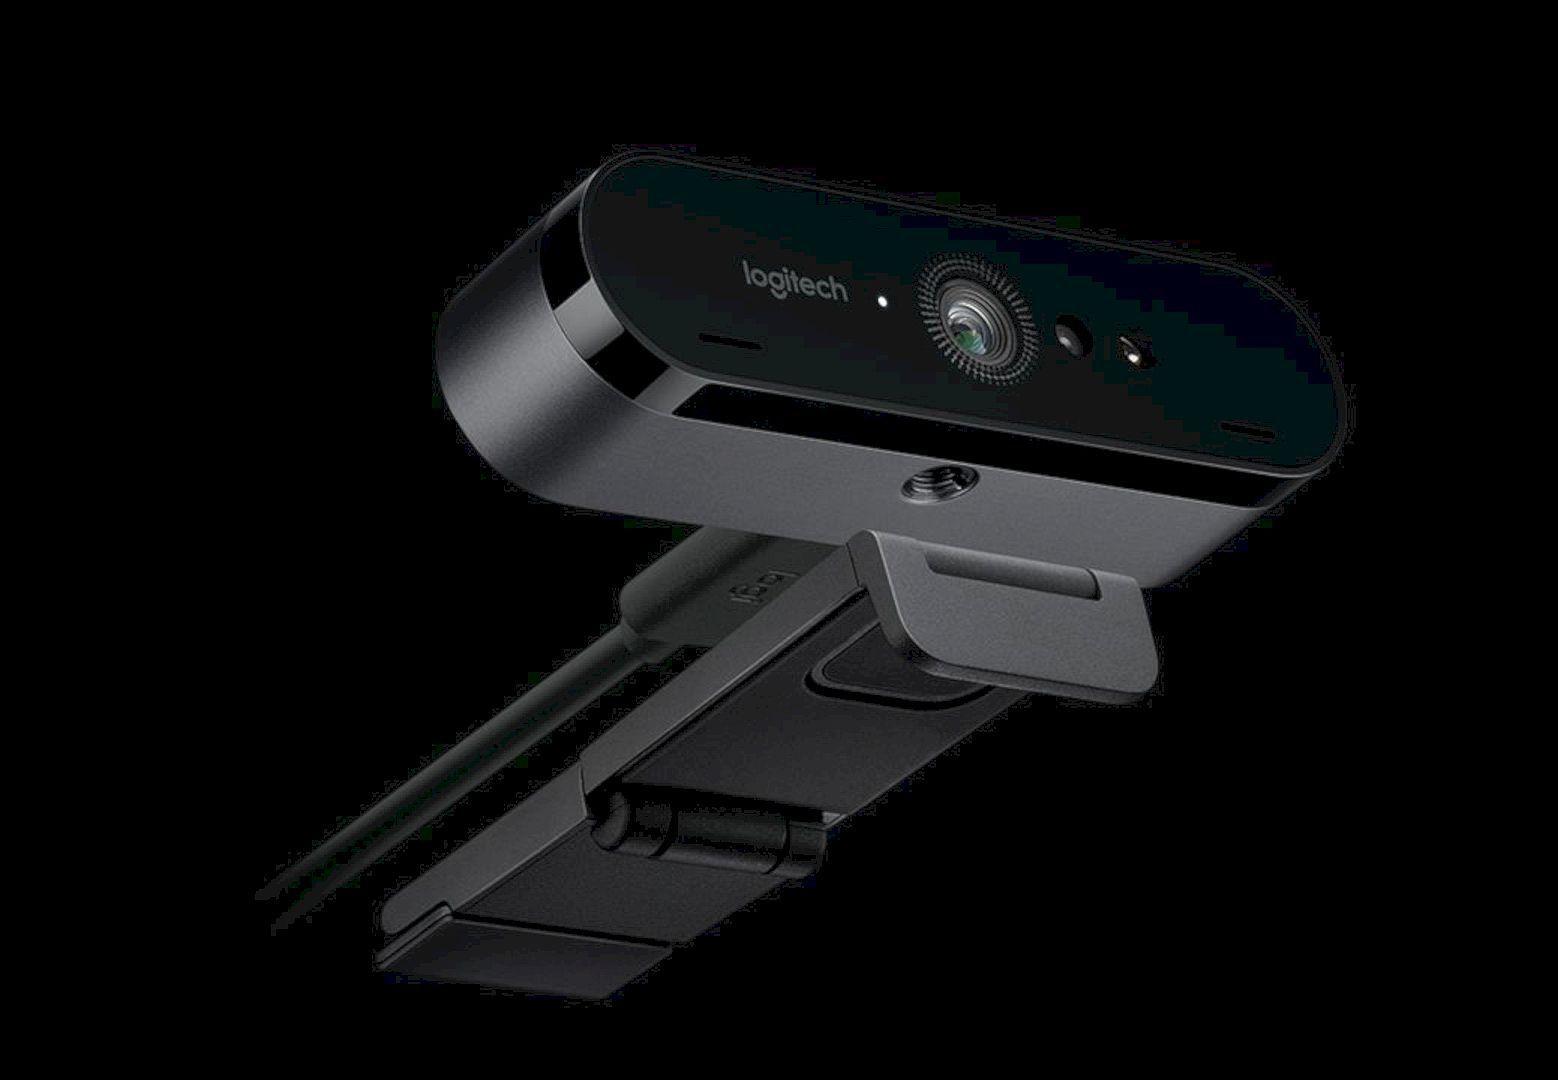 Pin On Gadget